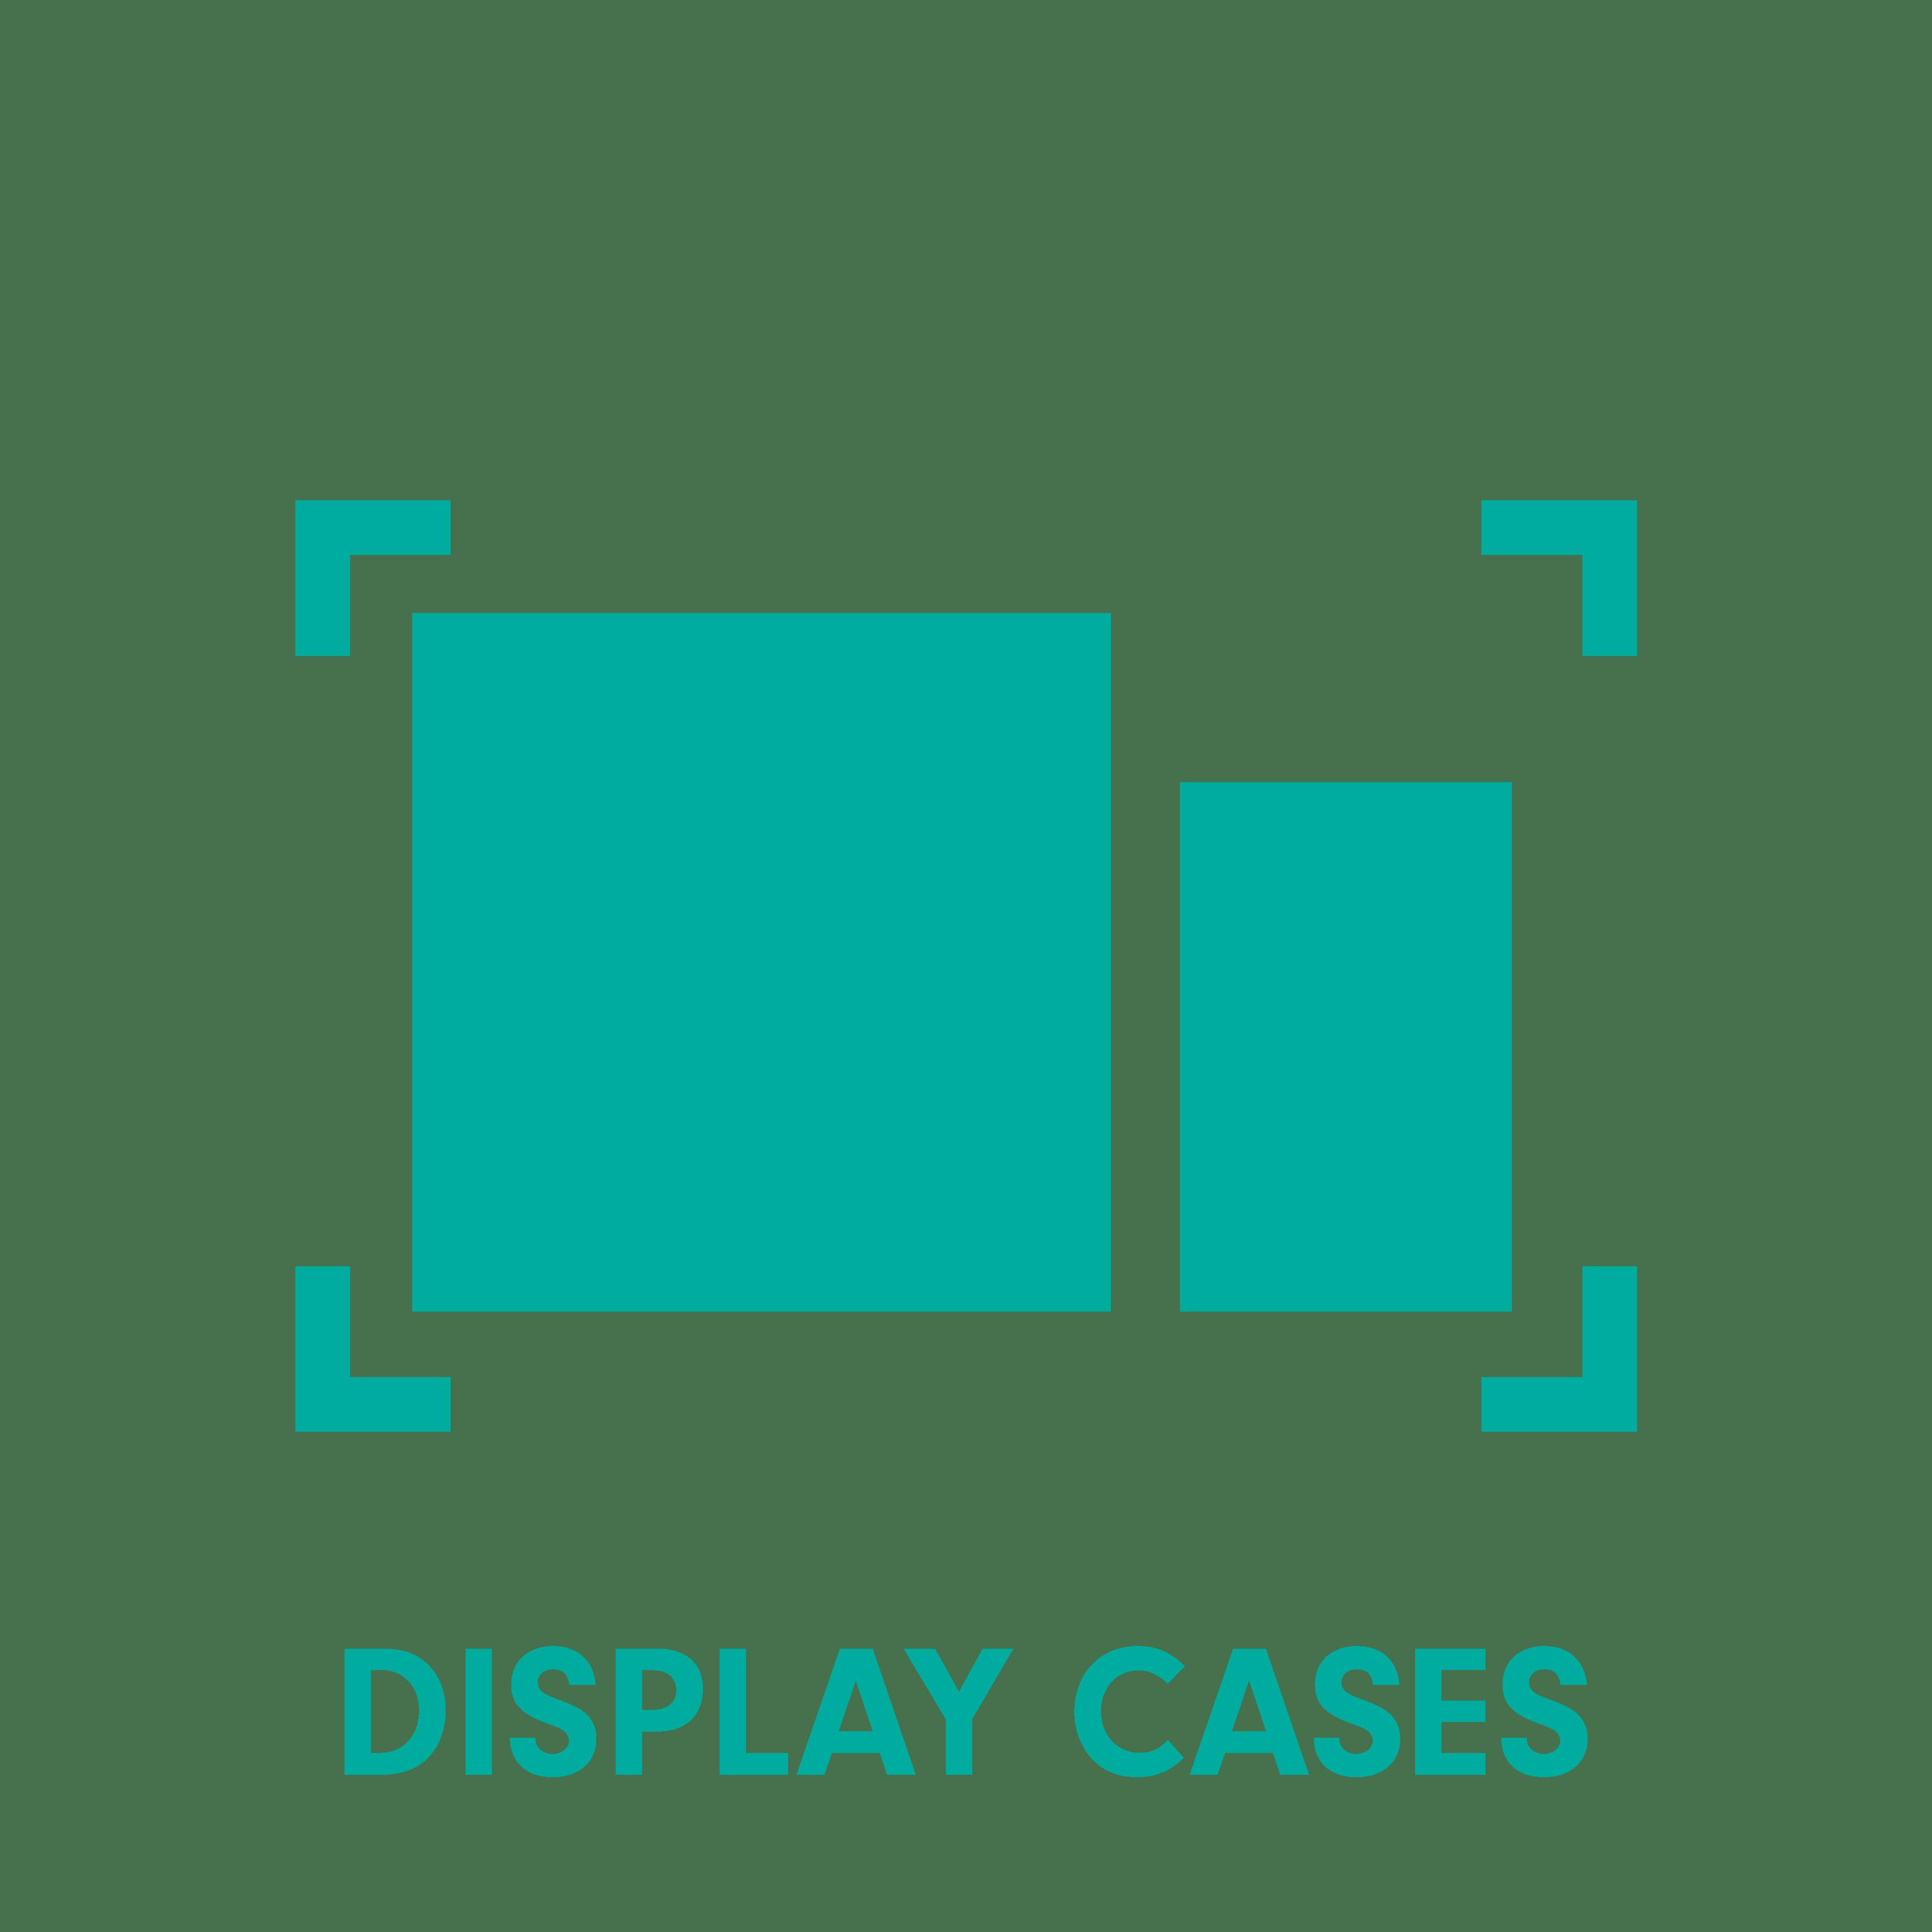 Display Cases Colour Logo